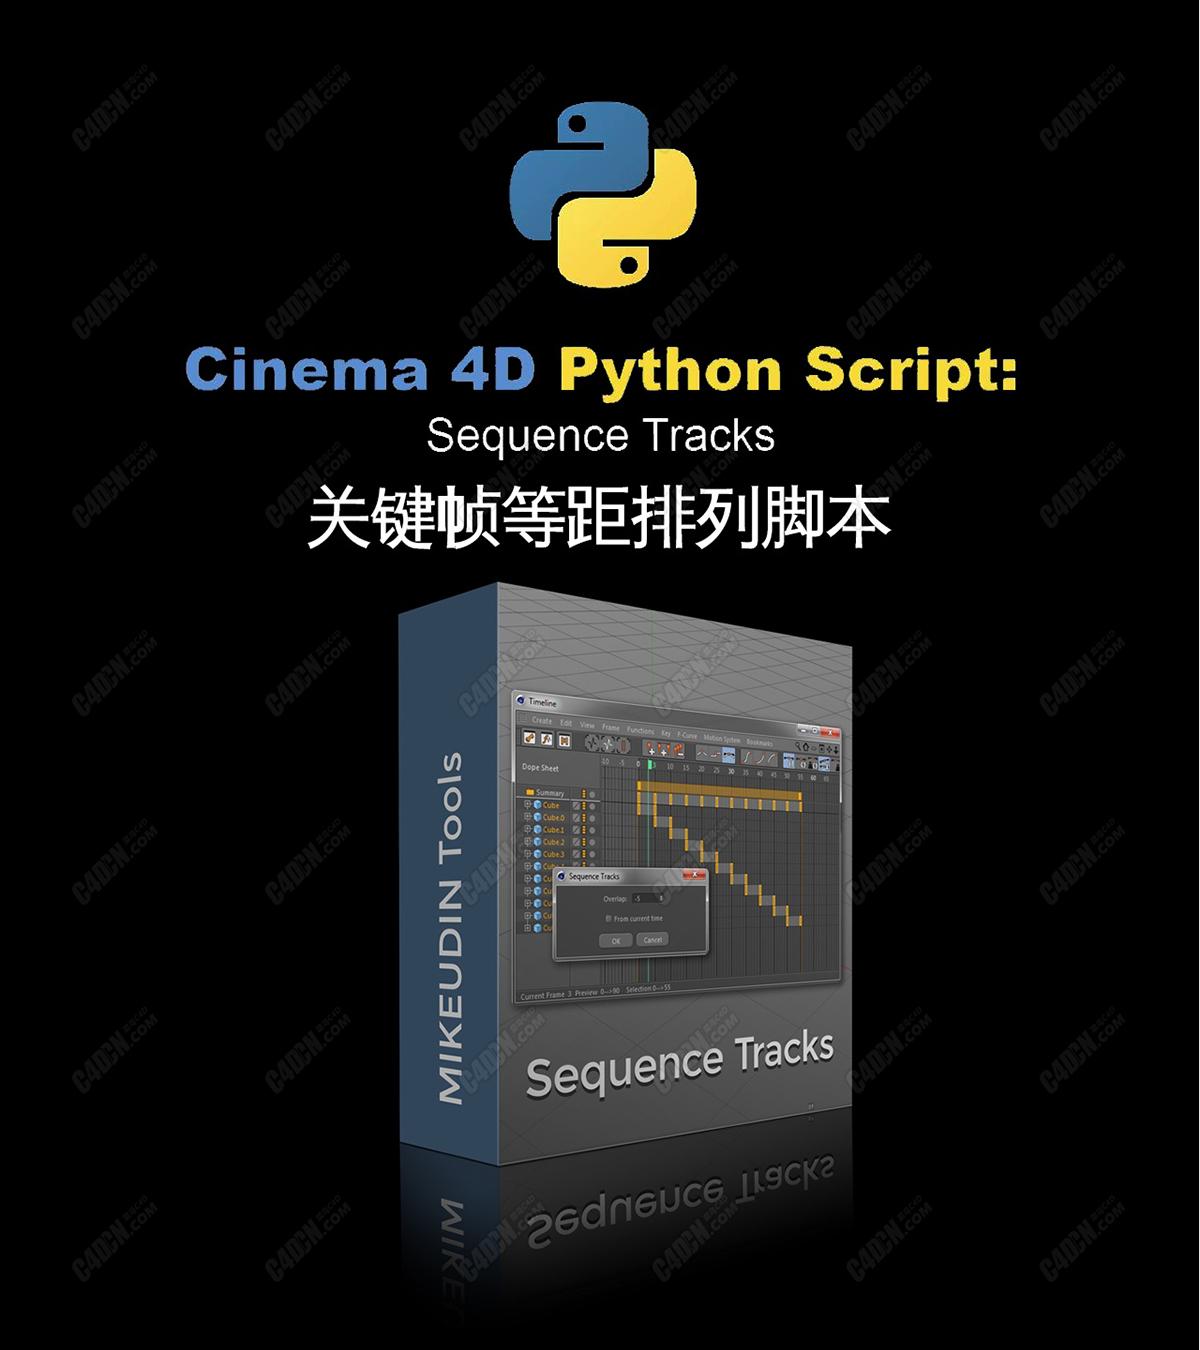 C4D关键帧等距排列脚本 Cinema 4D Python Script Sequence tracks